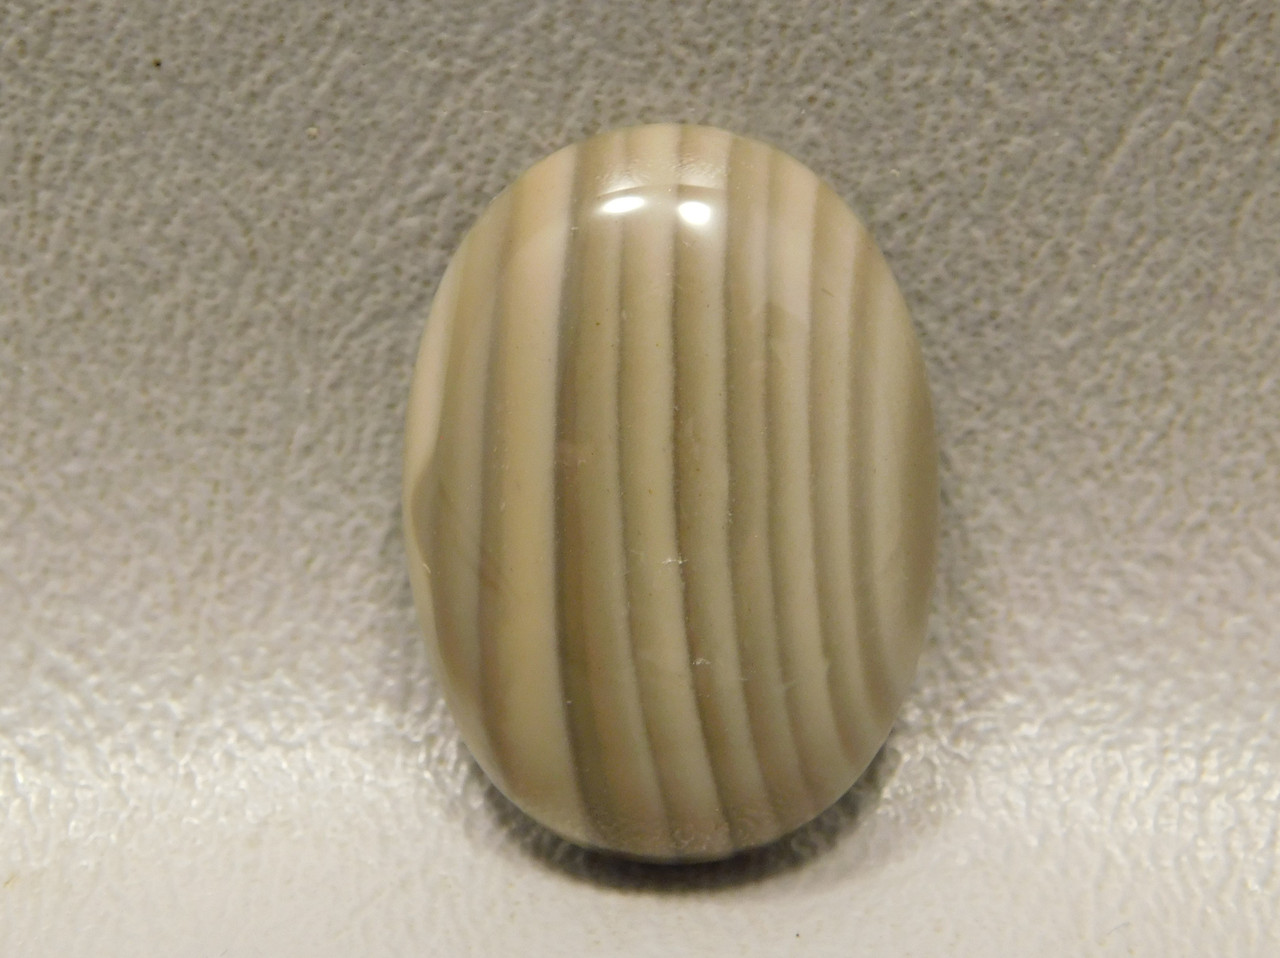 Cabochon Stone Striped Polish Flint  25 mm by 18 mm Oval #20